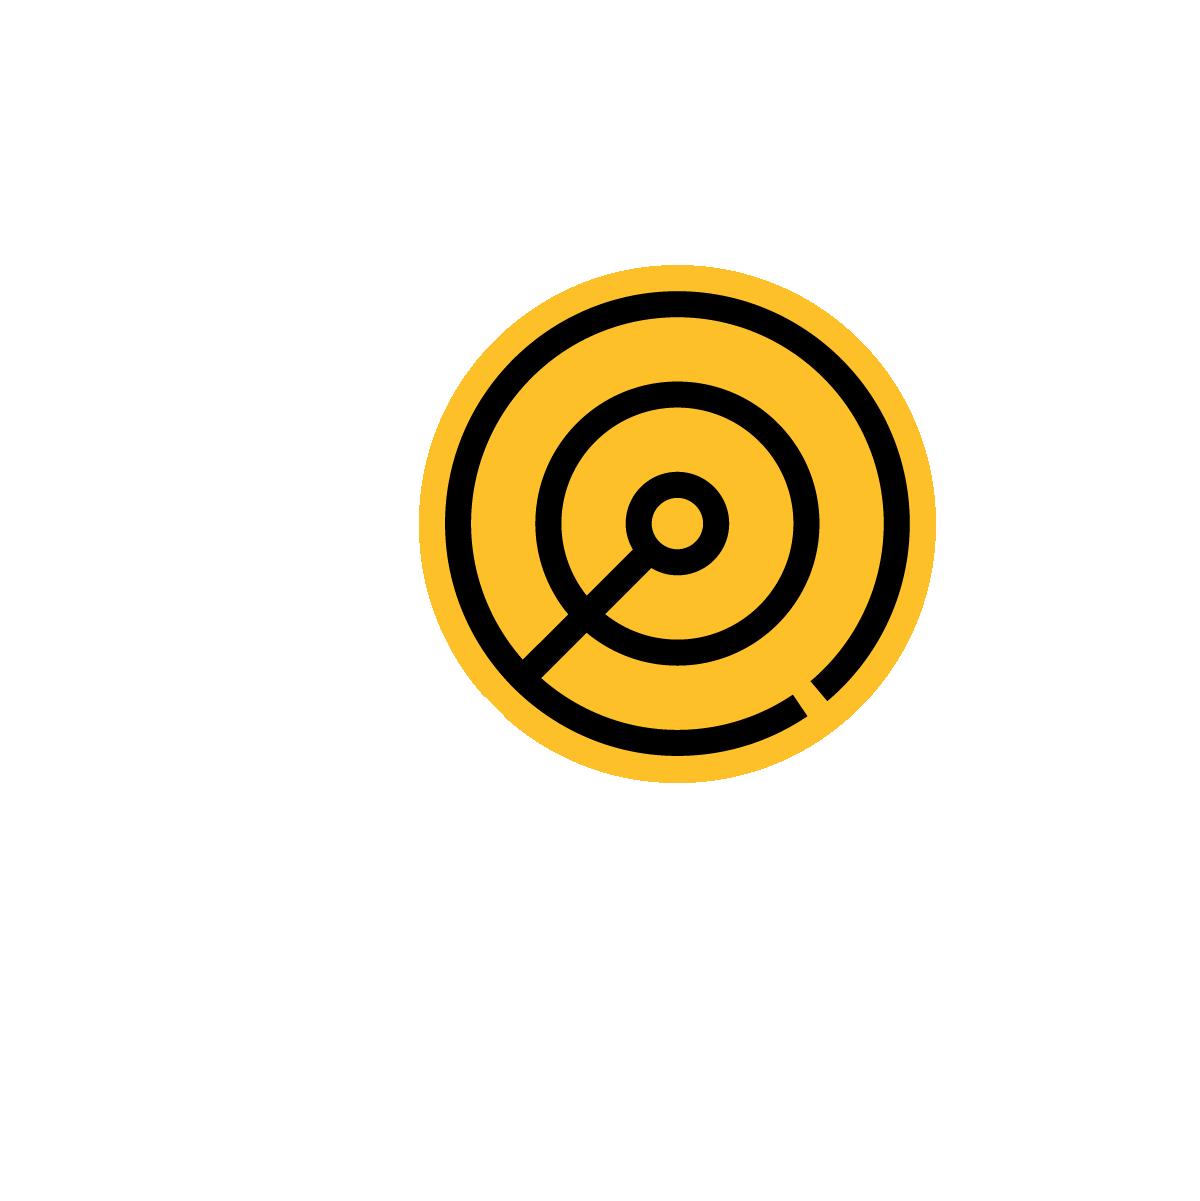 AG - Icon - Target ΓÇö White